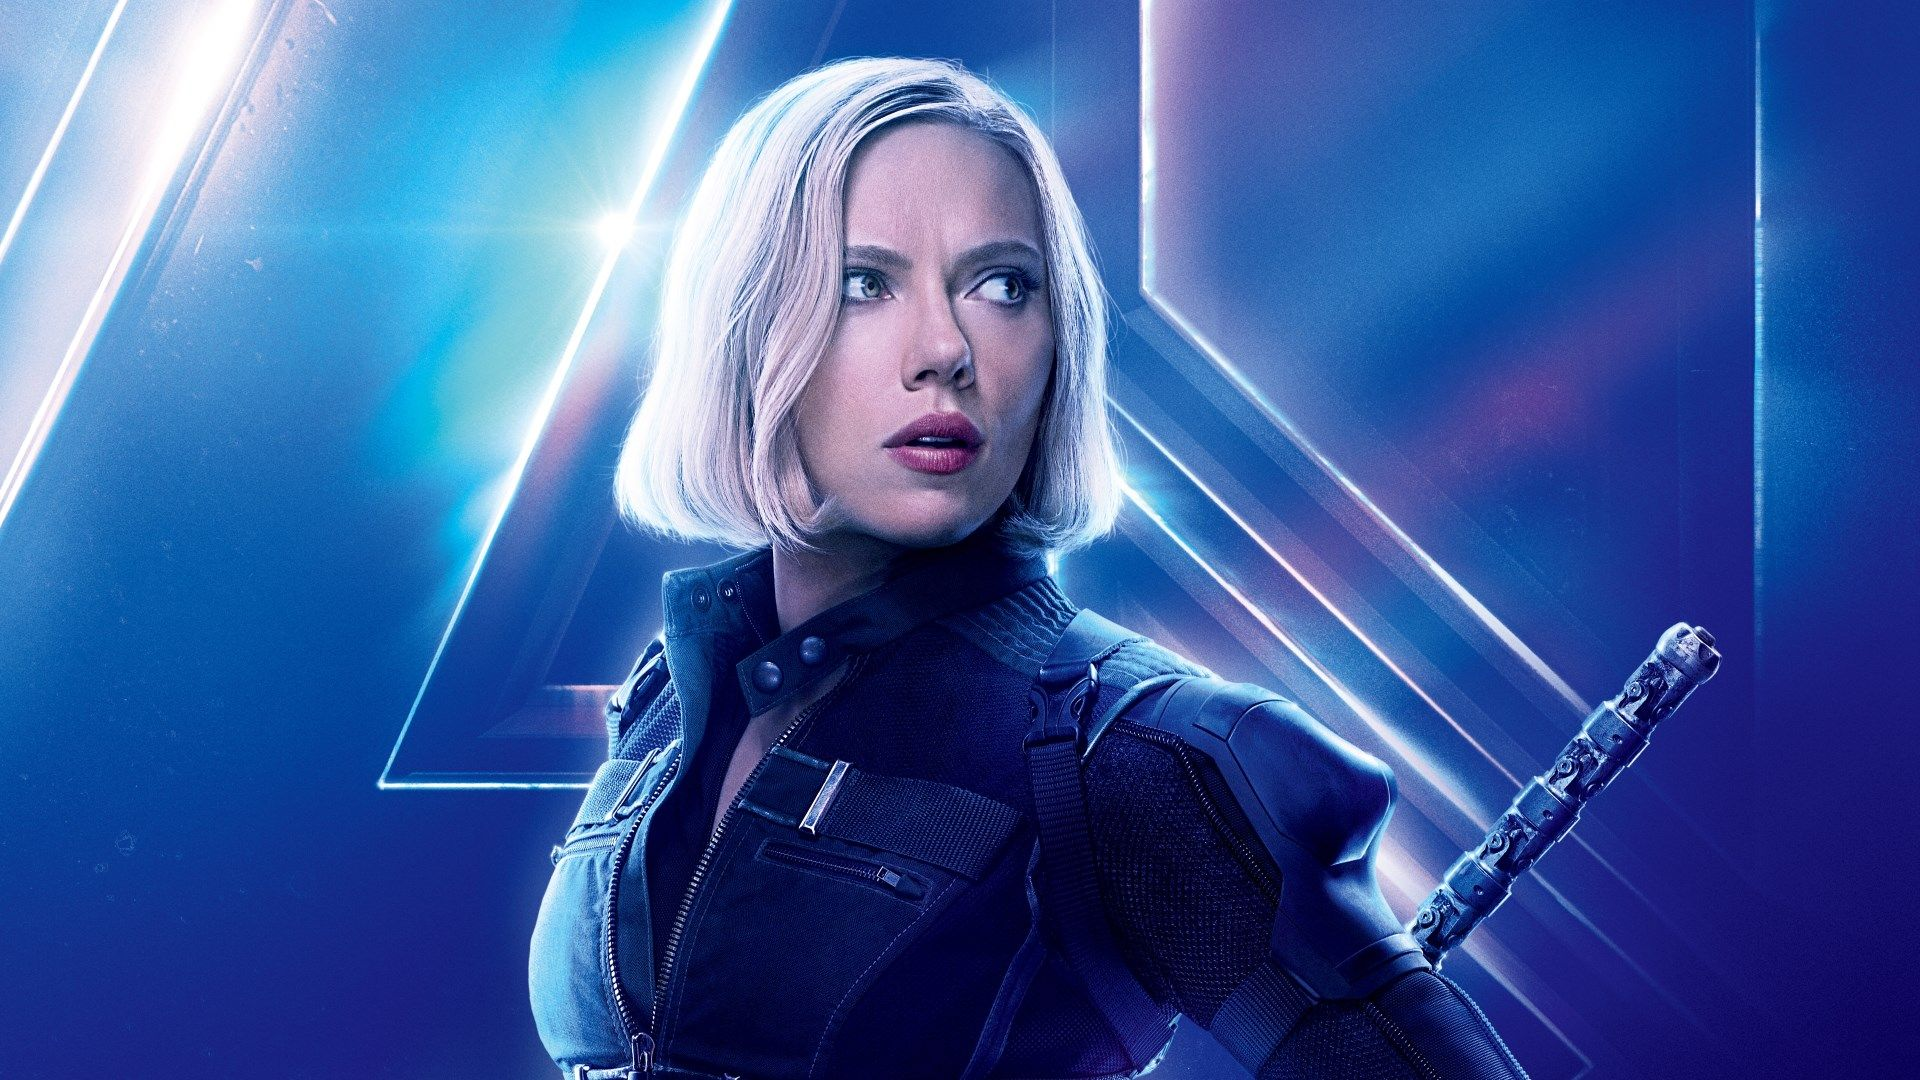 Black Widow Infinity War HD Wallpaper Avengers infinity war 1920x1080